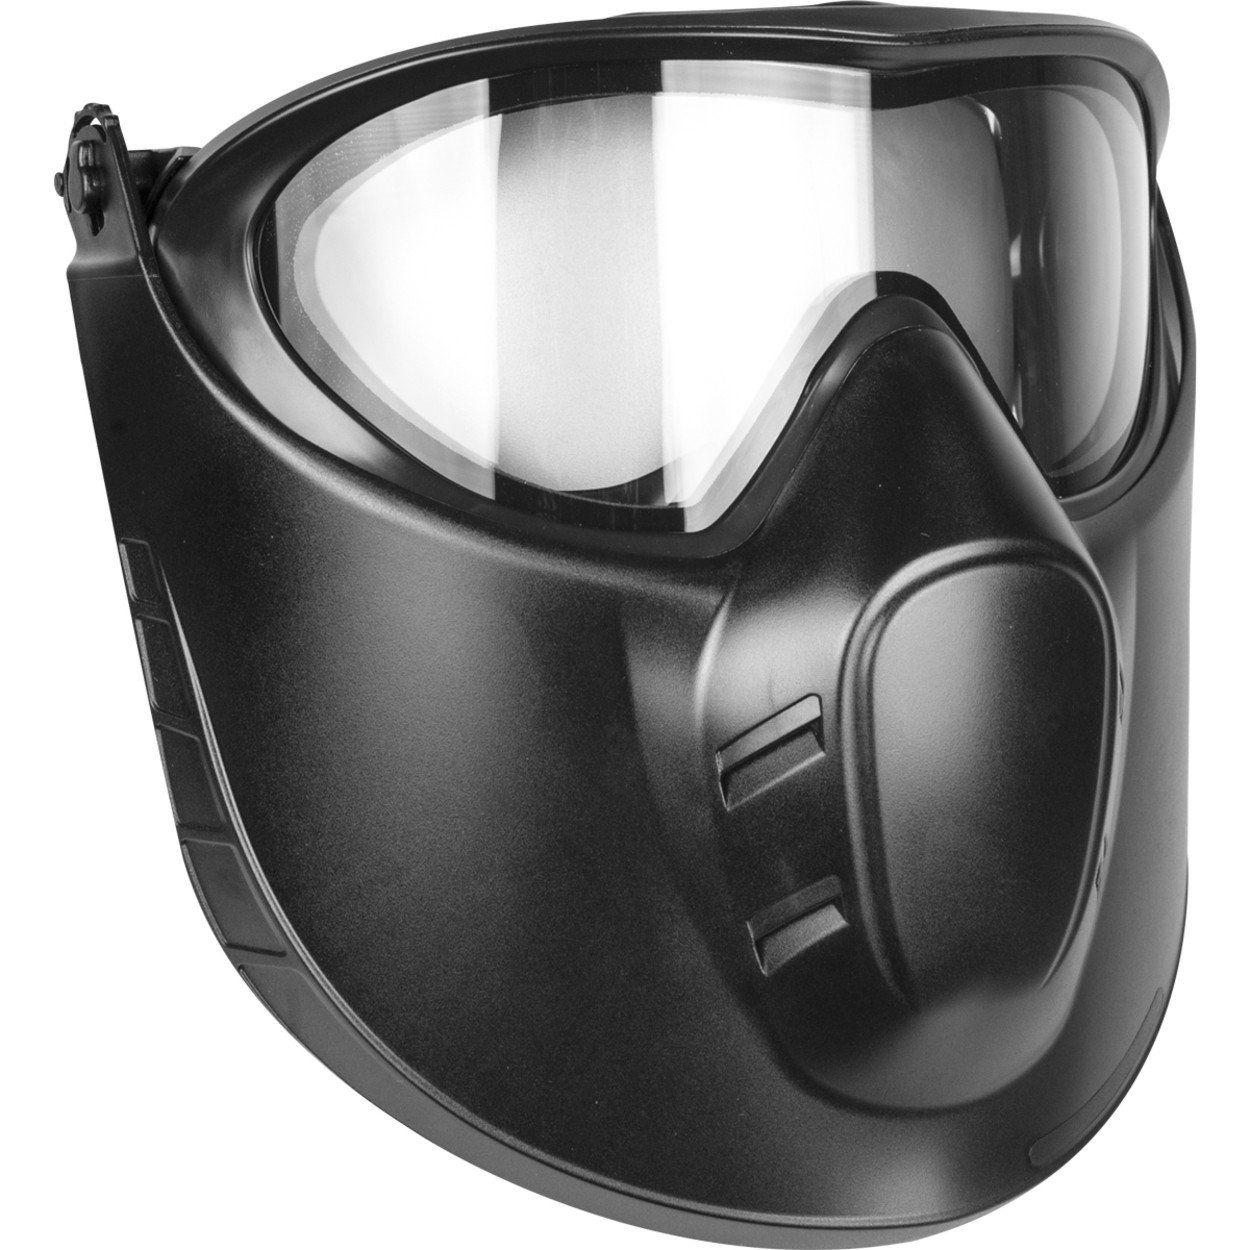 Valken Vsm Thermal Airsoft Goggles W/Face Shield BlackGrey